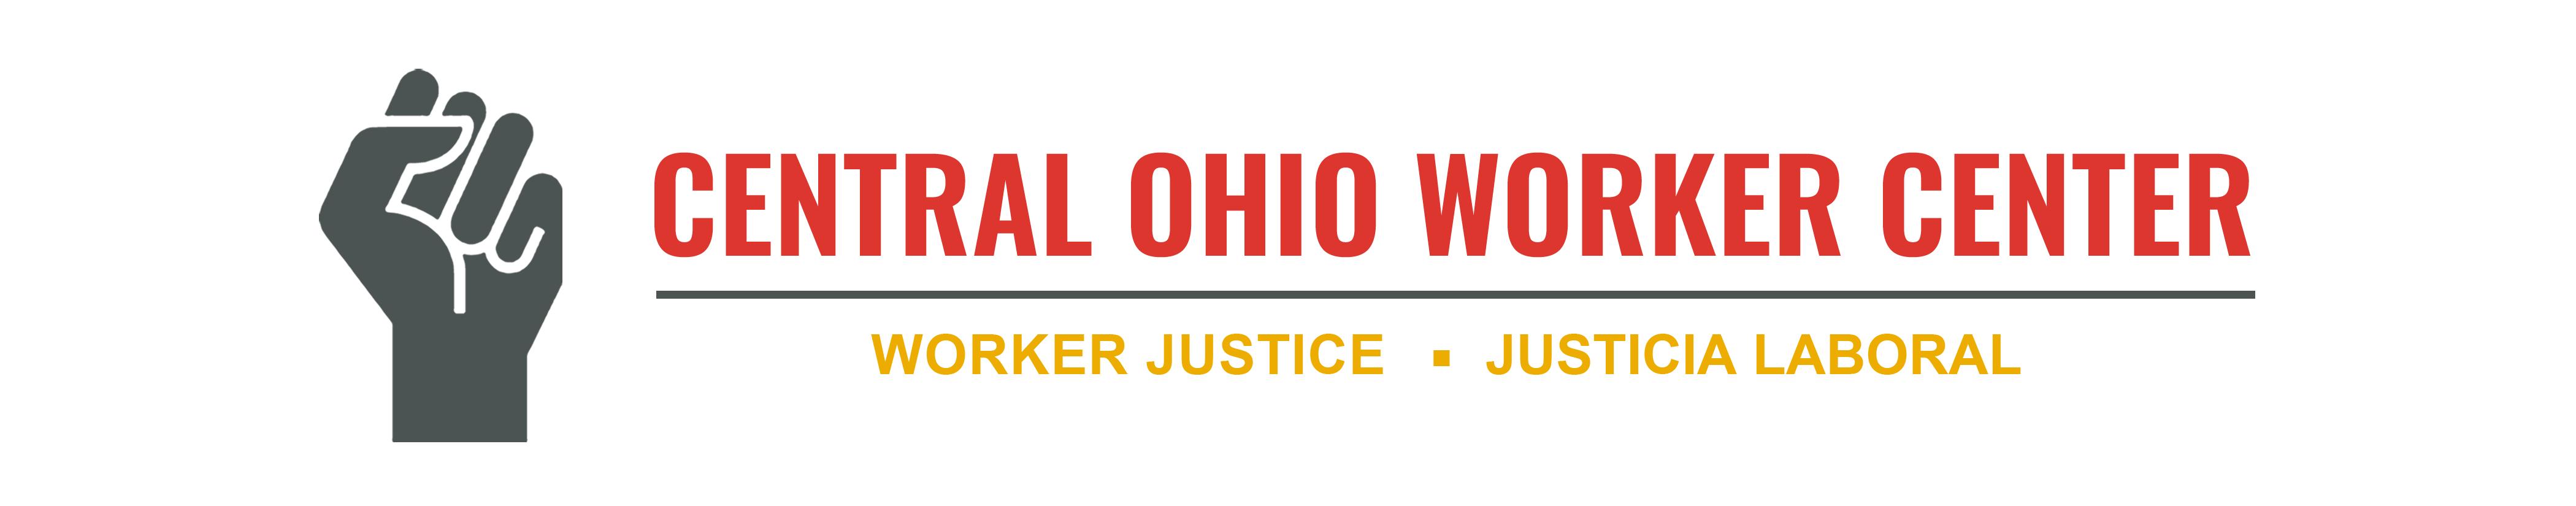 Central Ohio Worker Center |